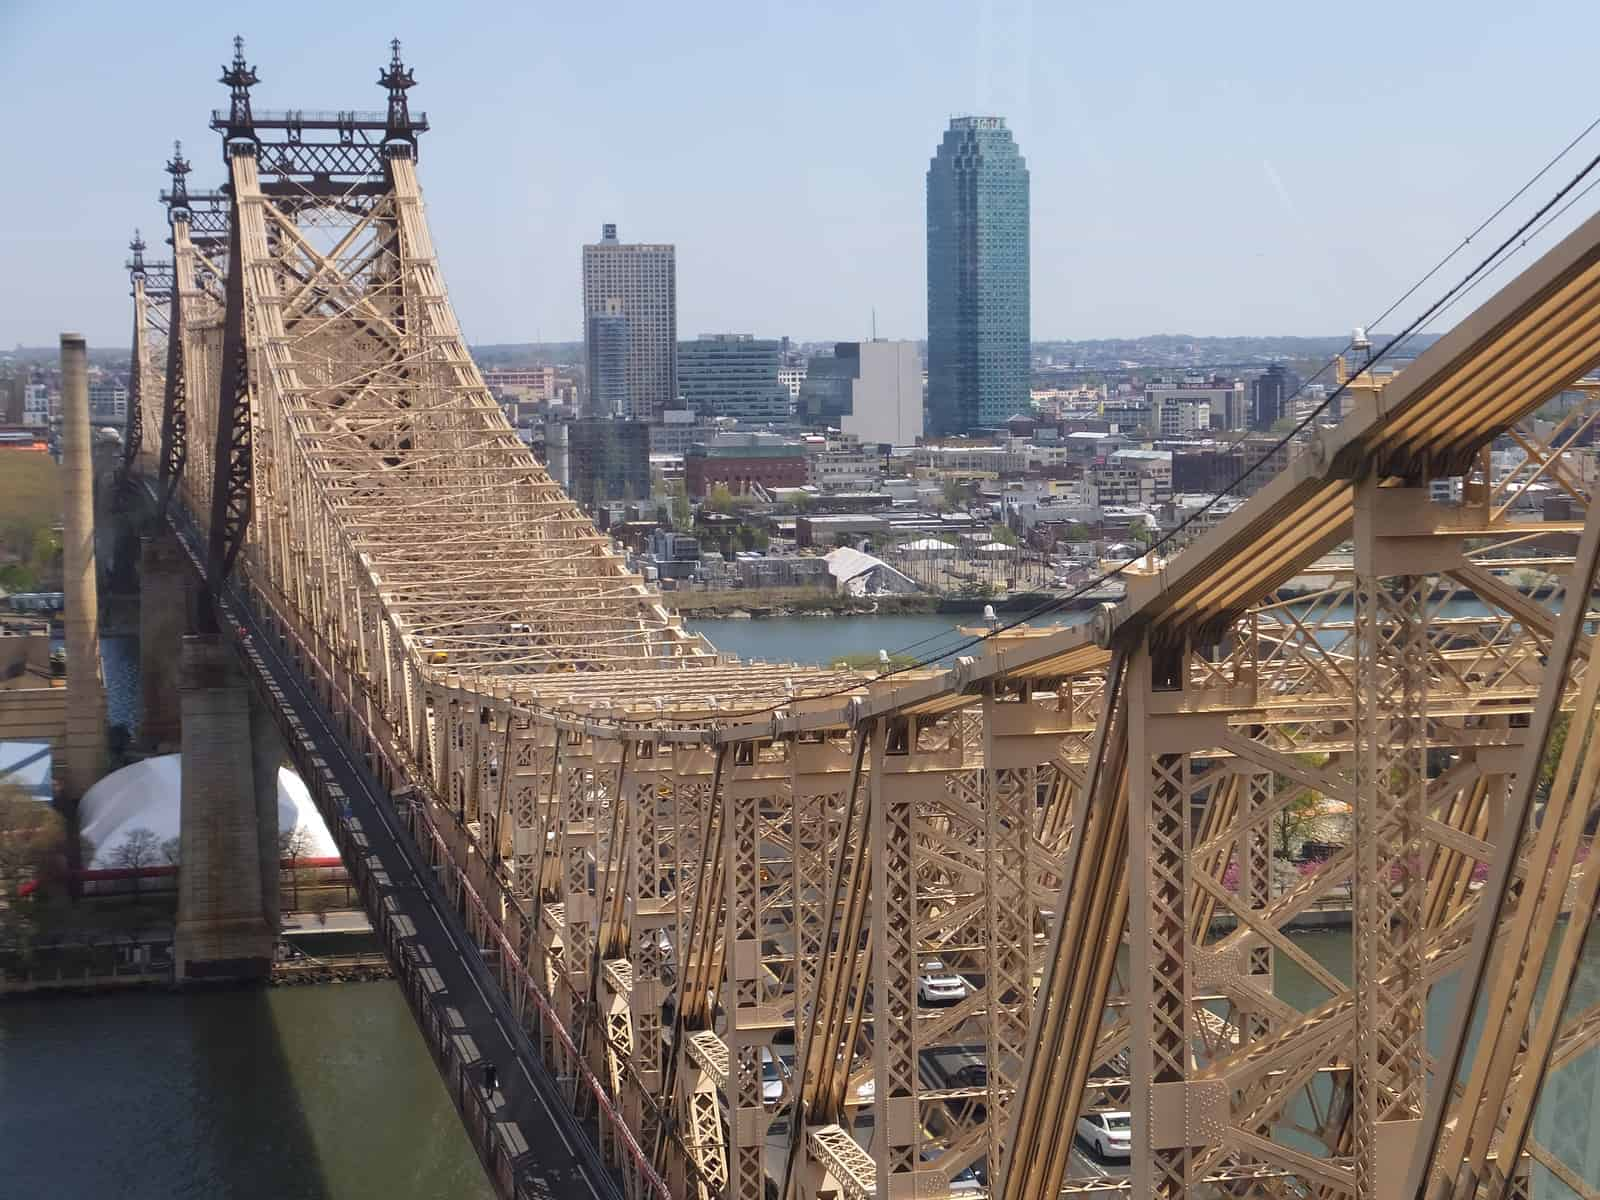 Flushing Queens, New York Private Investigator